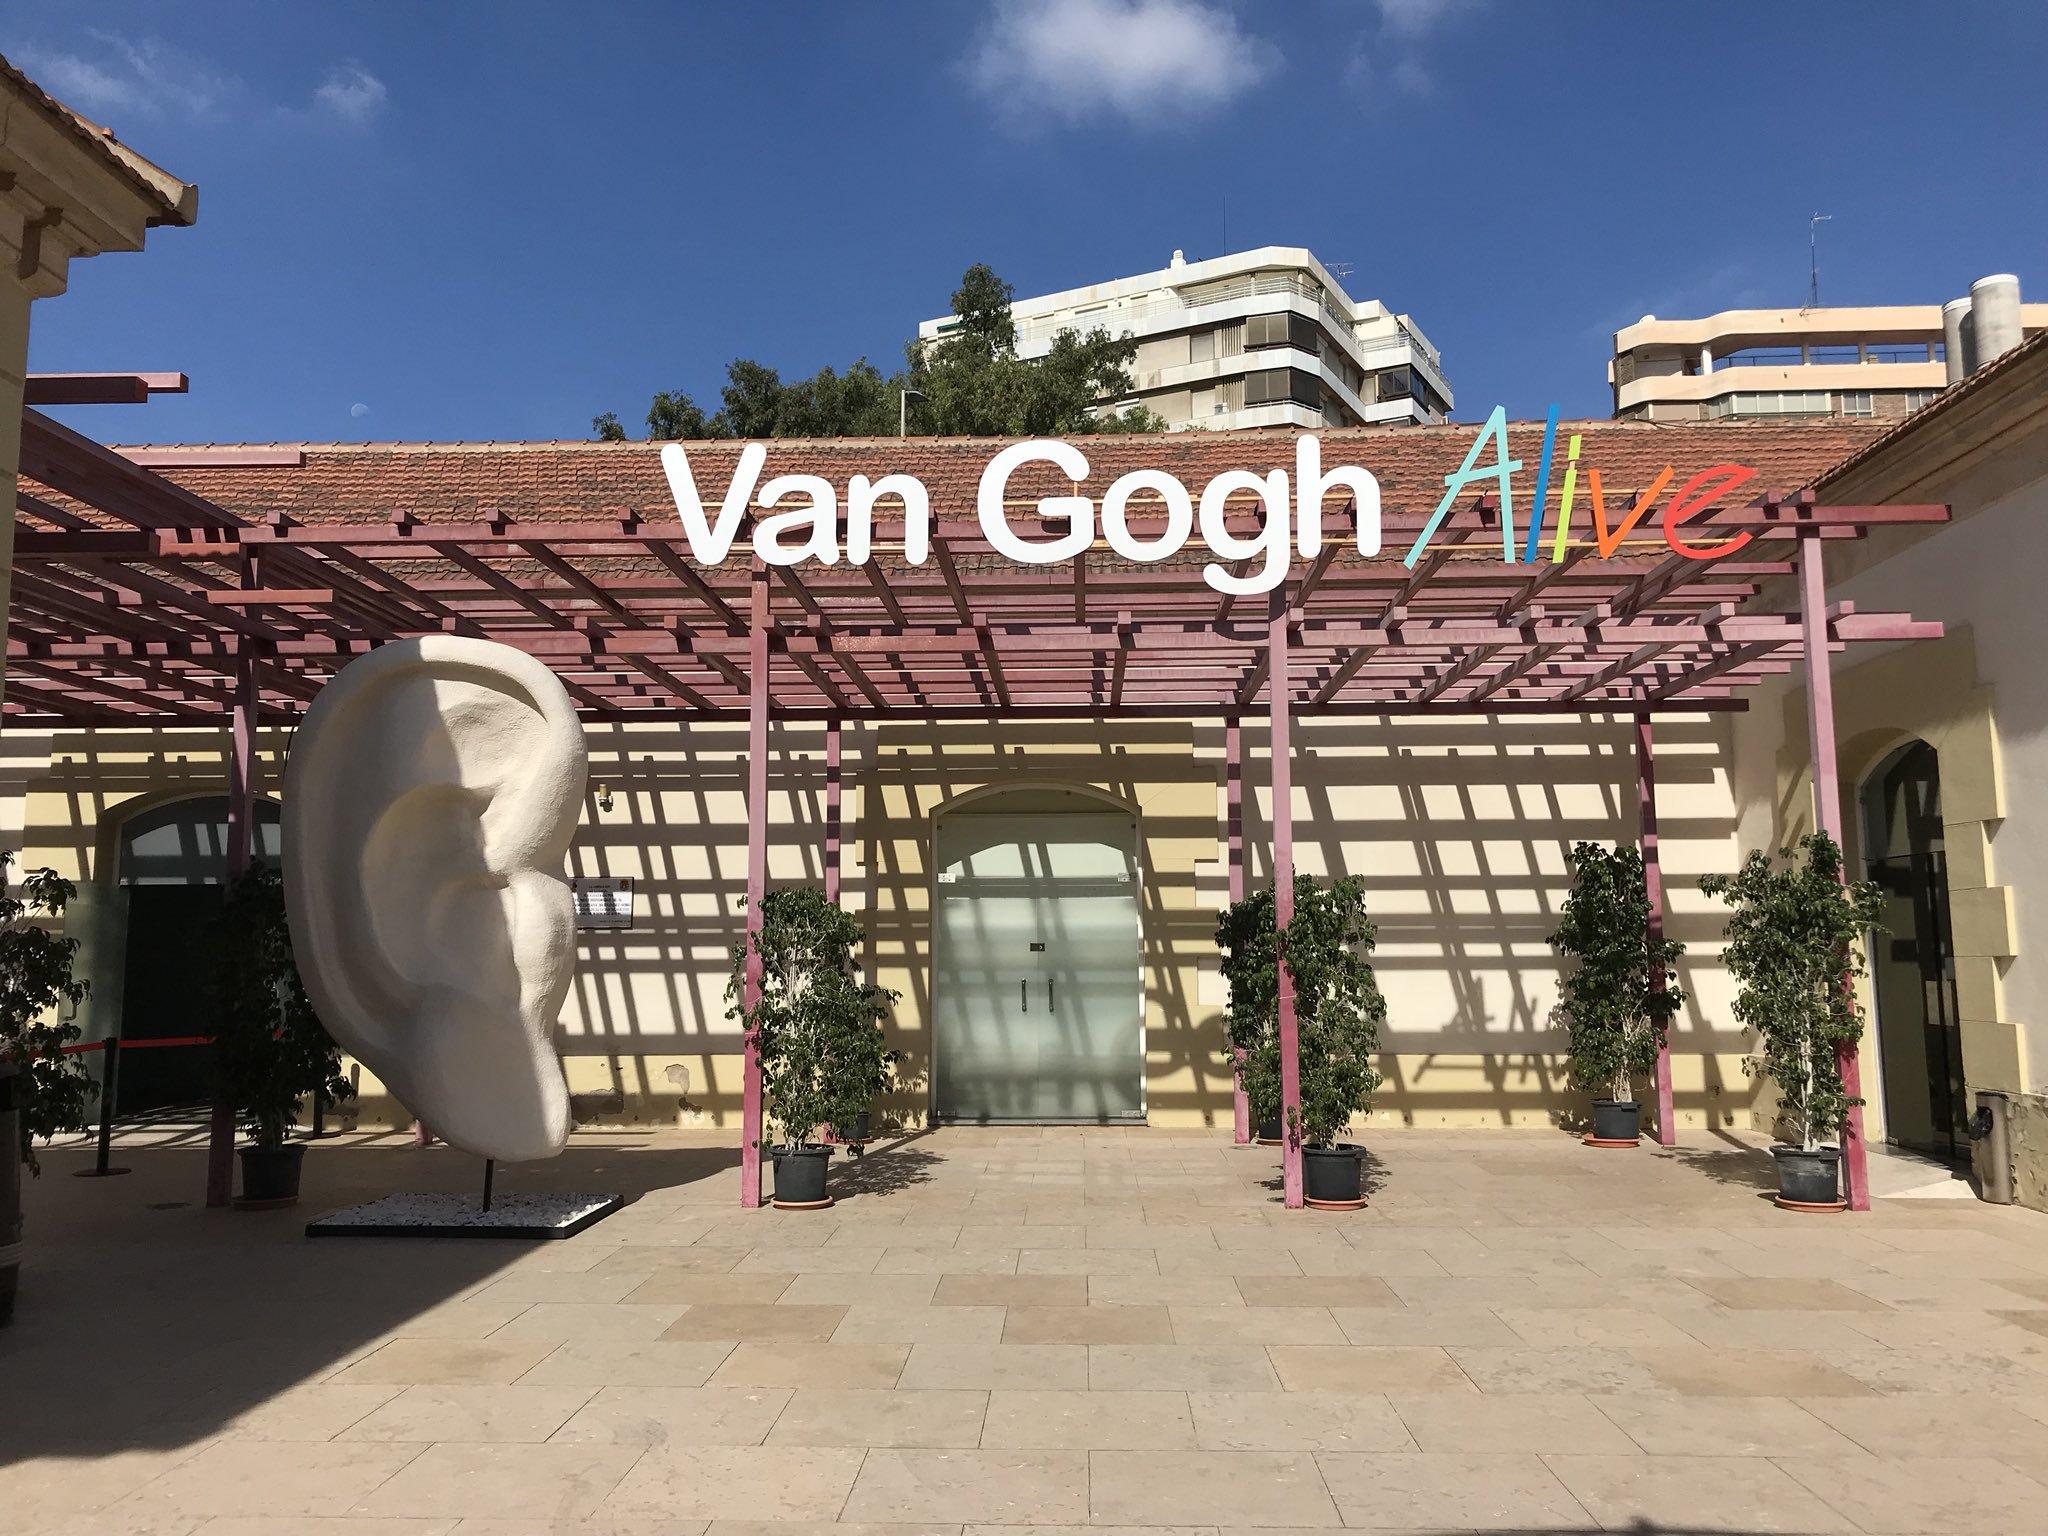 Van-Gogh-Alive-Madrid